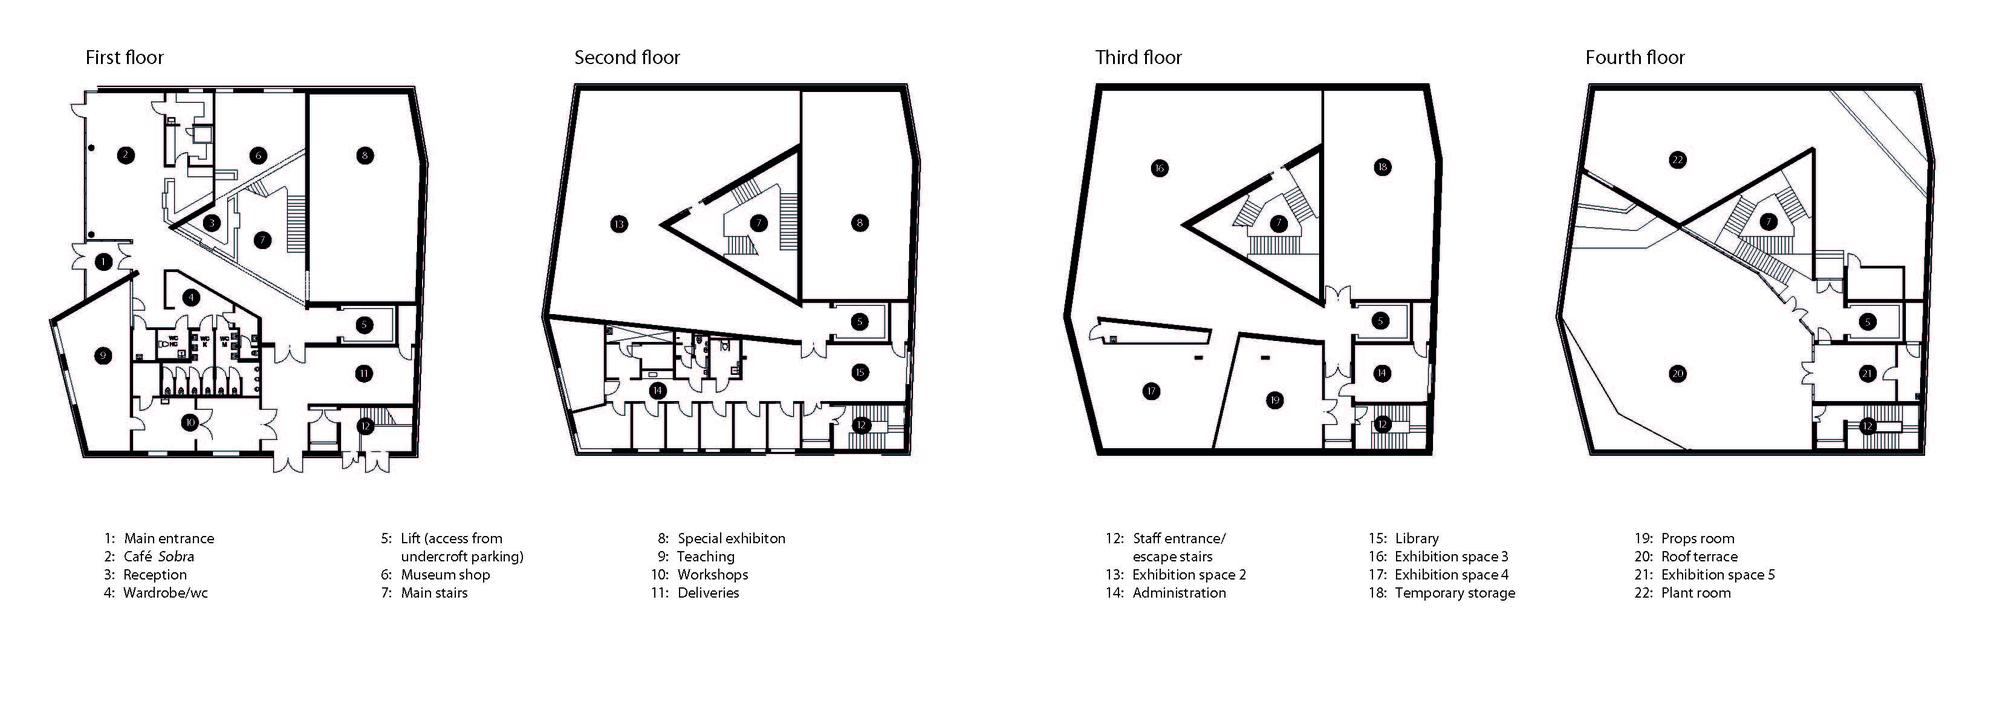 D Exhibition Floor Plan : Gallery of sogn fjordane art museum c f møller